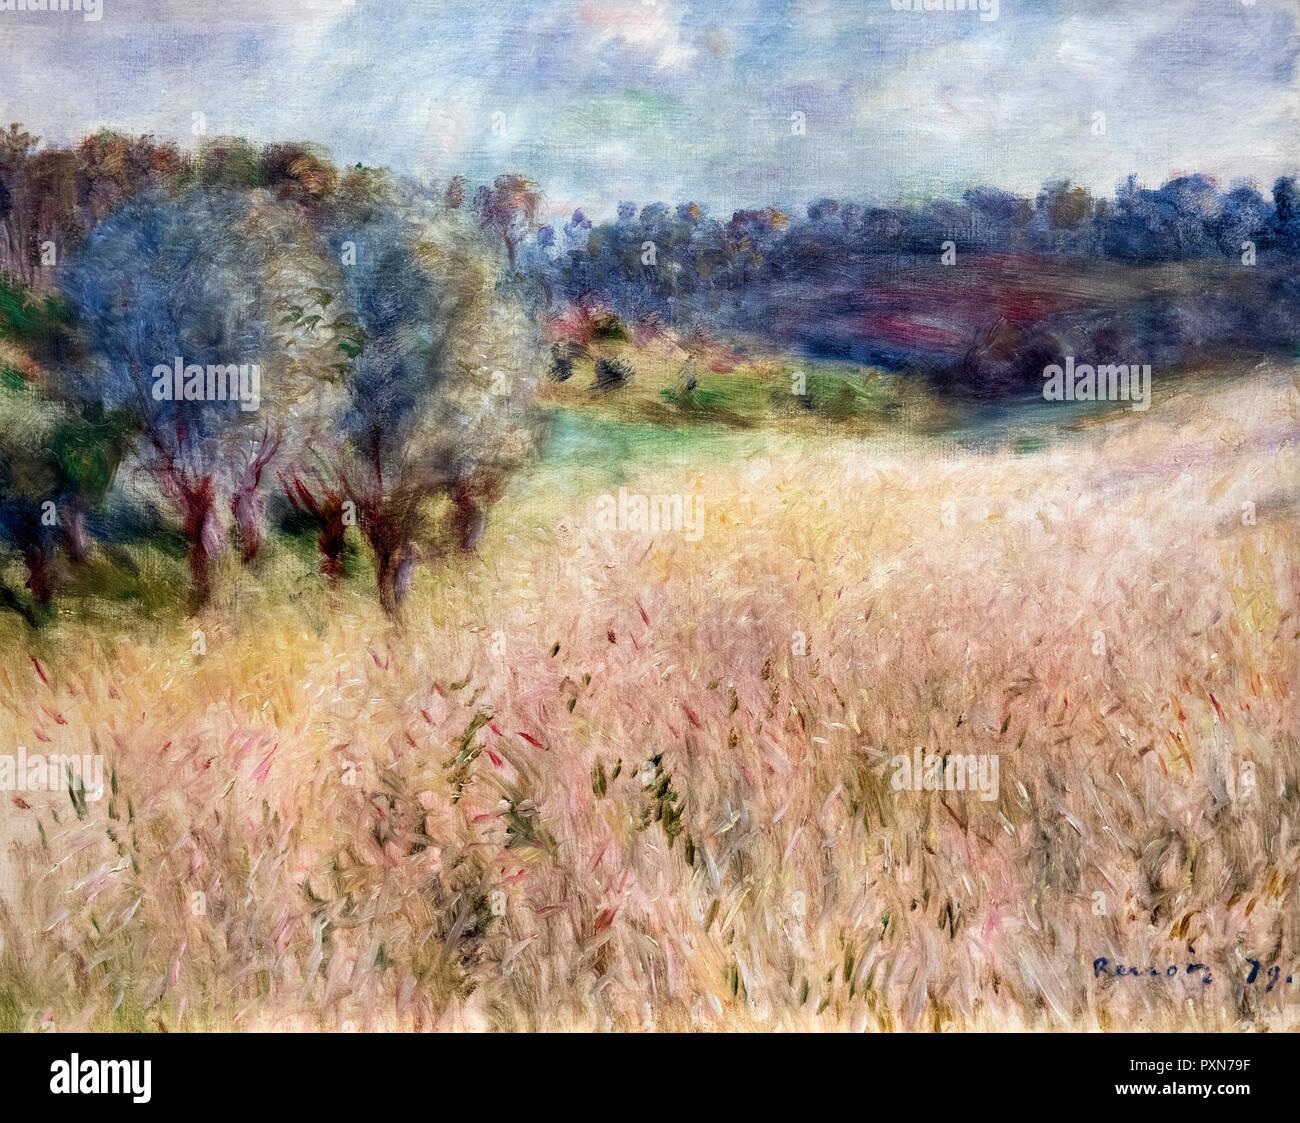 Wheatfield by Pierre Auguste Renoir (1841-1919), oil on canvas, 1879 - Stock Image